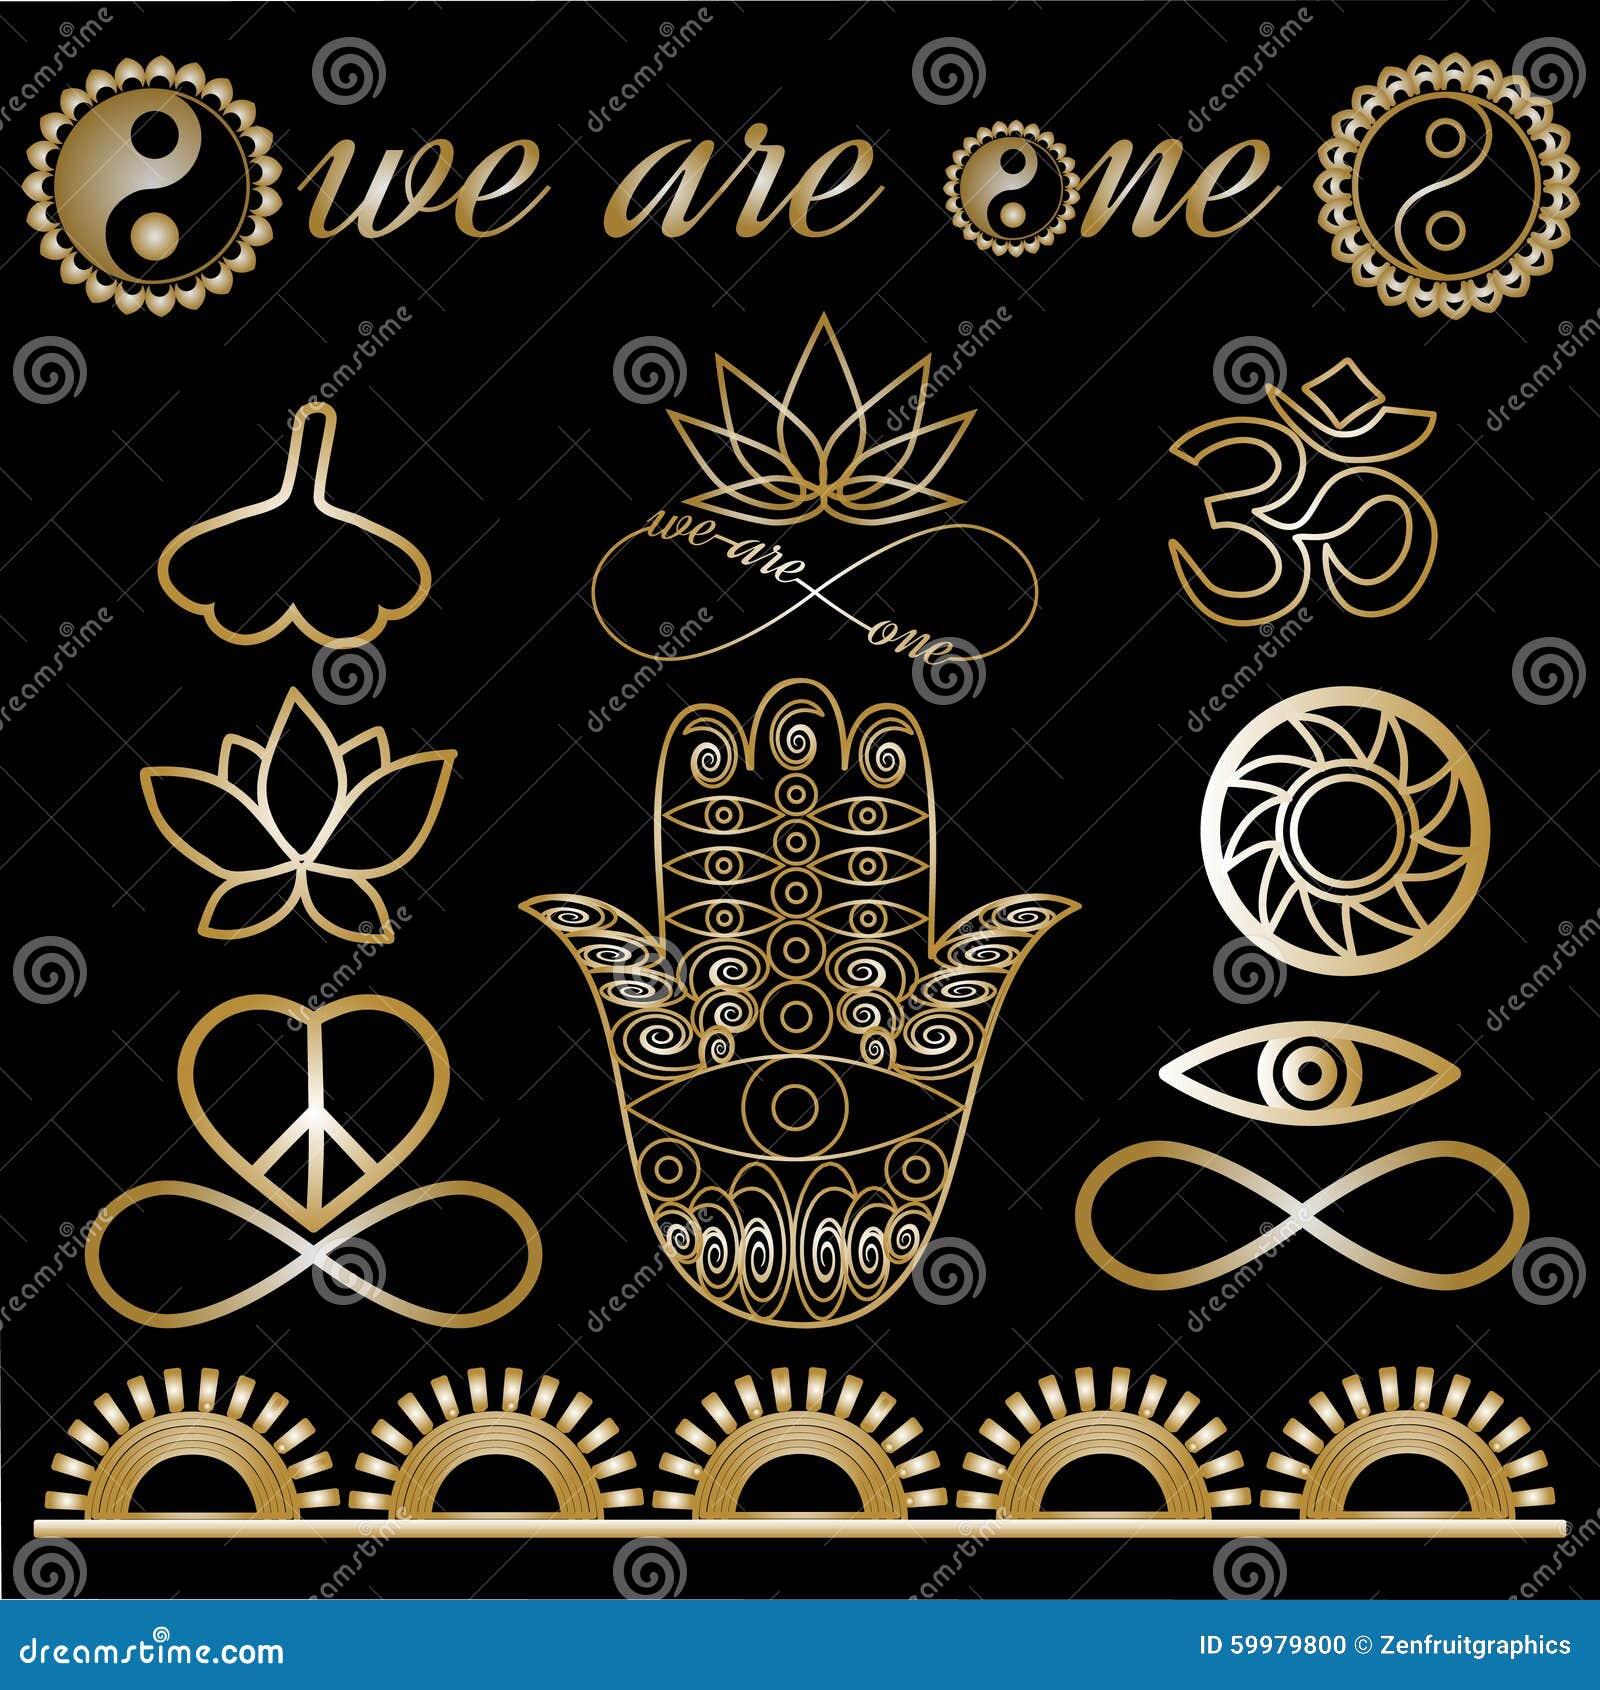 yoga logo yoga icons mystic spiritual symbols gold